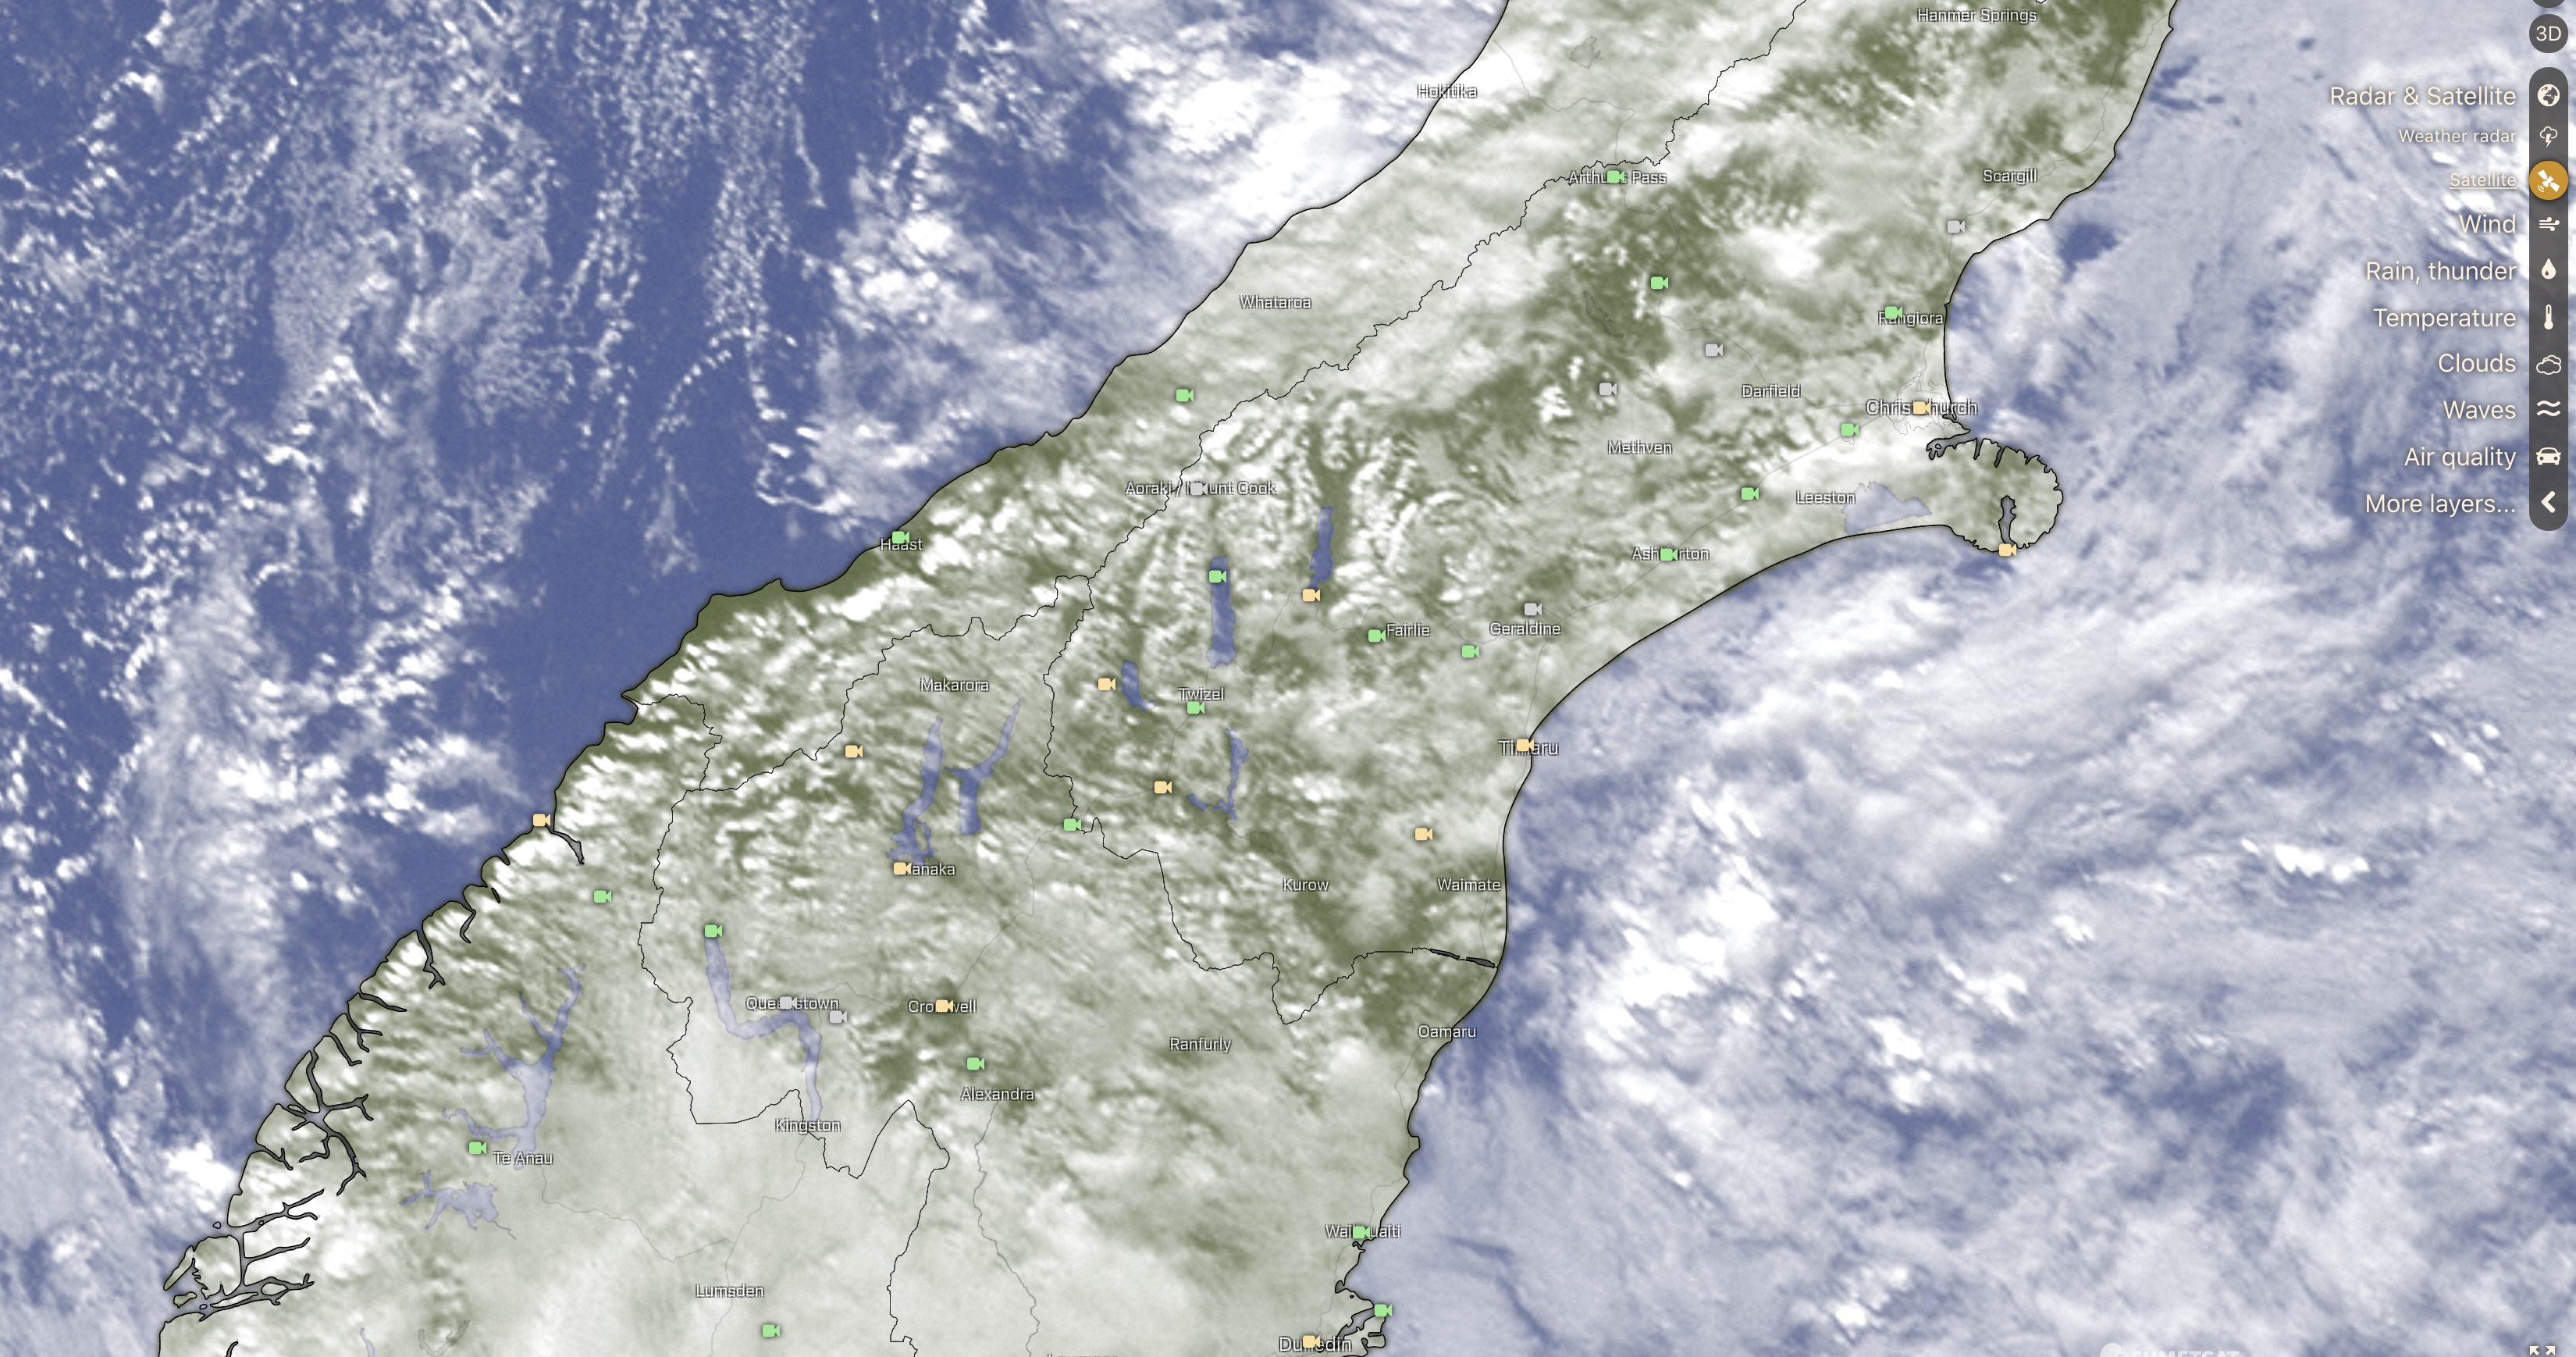 Windy.com satellite imagery